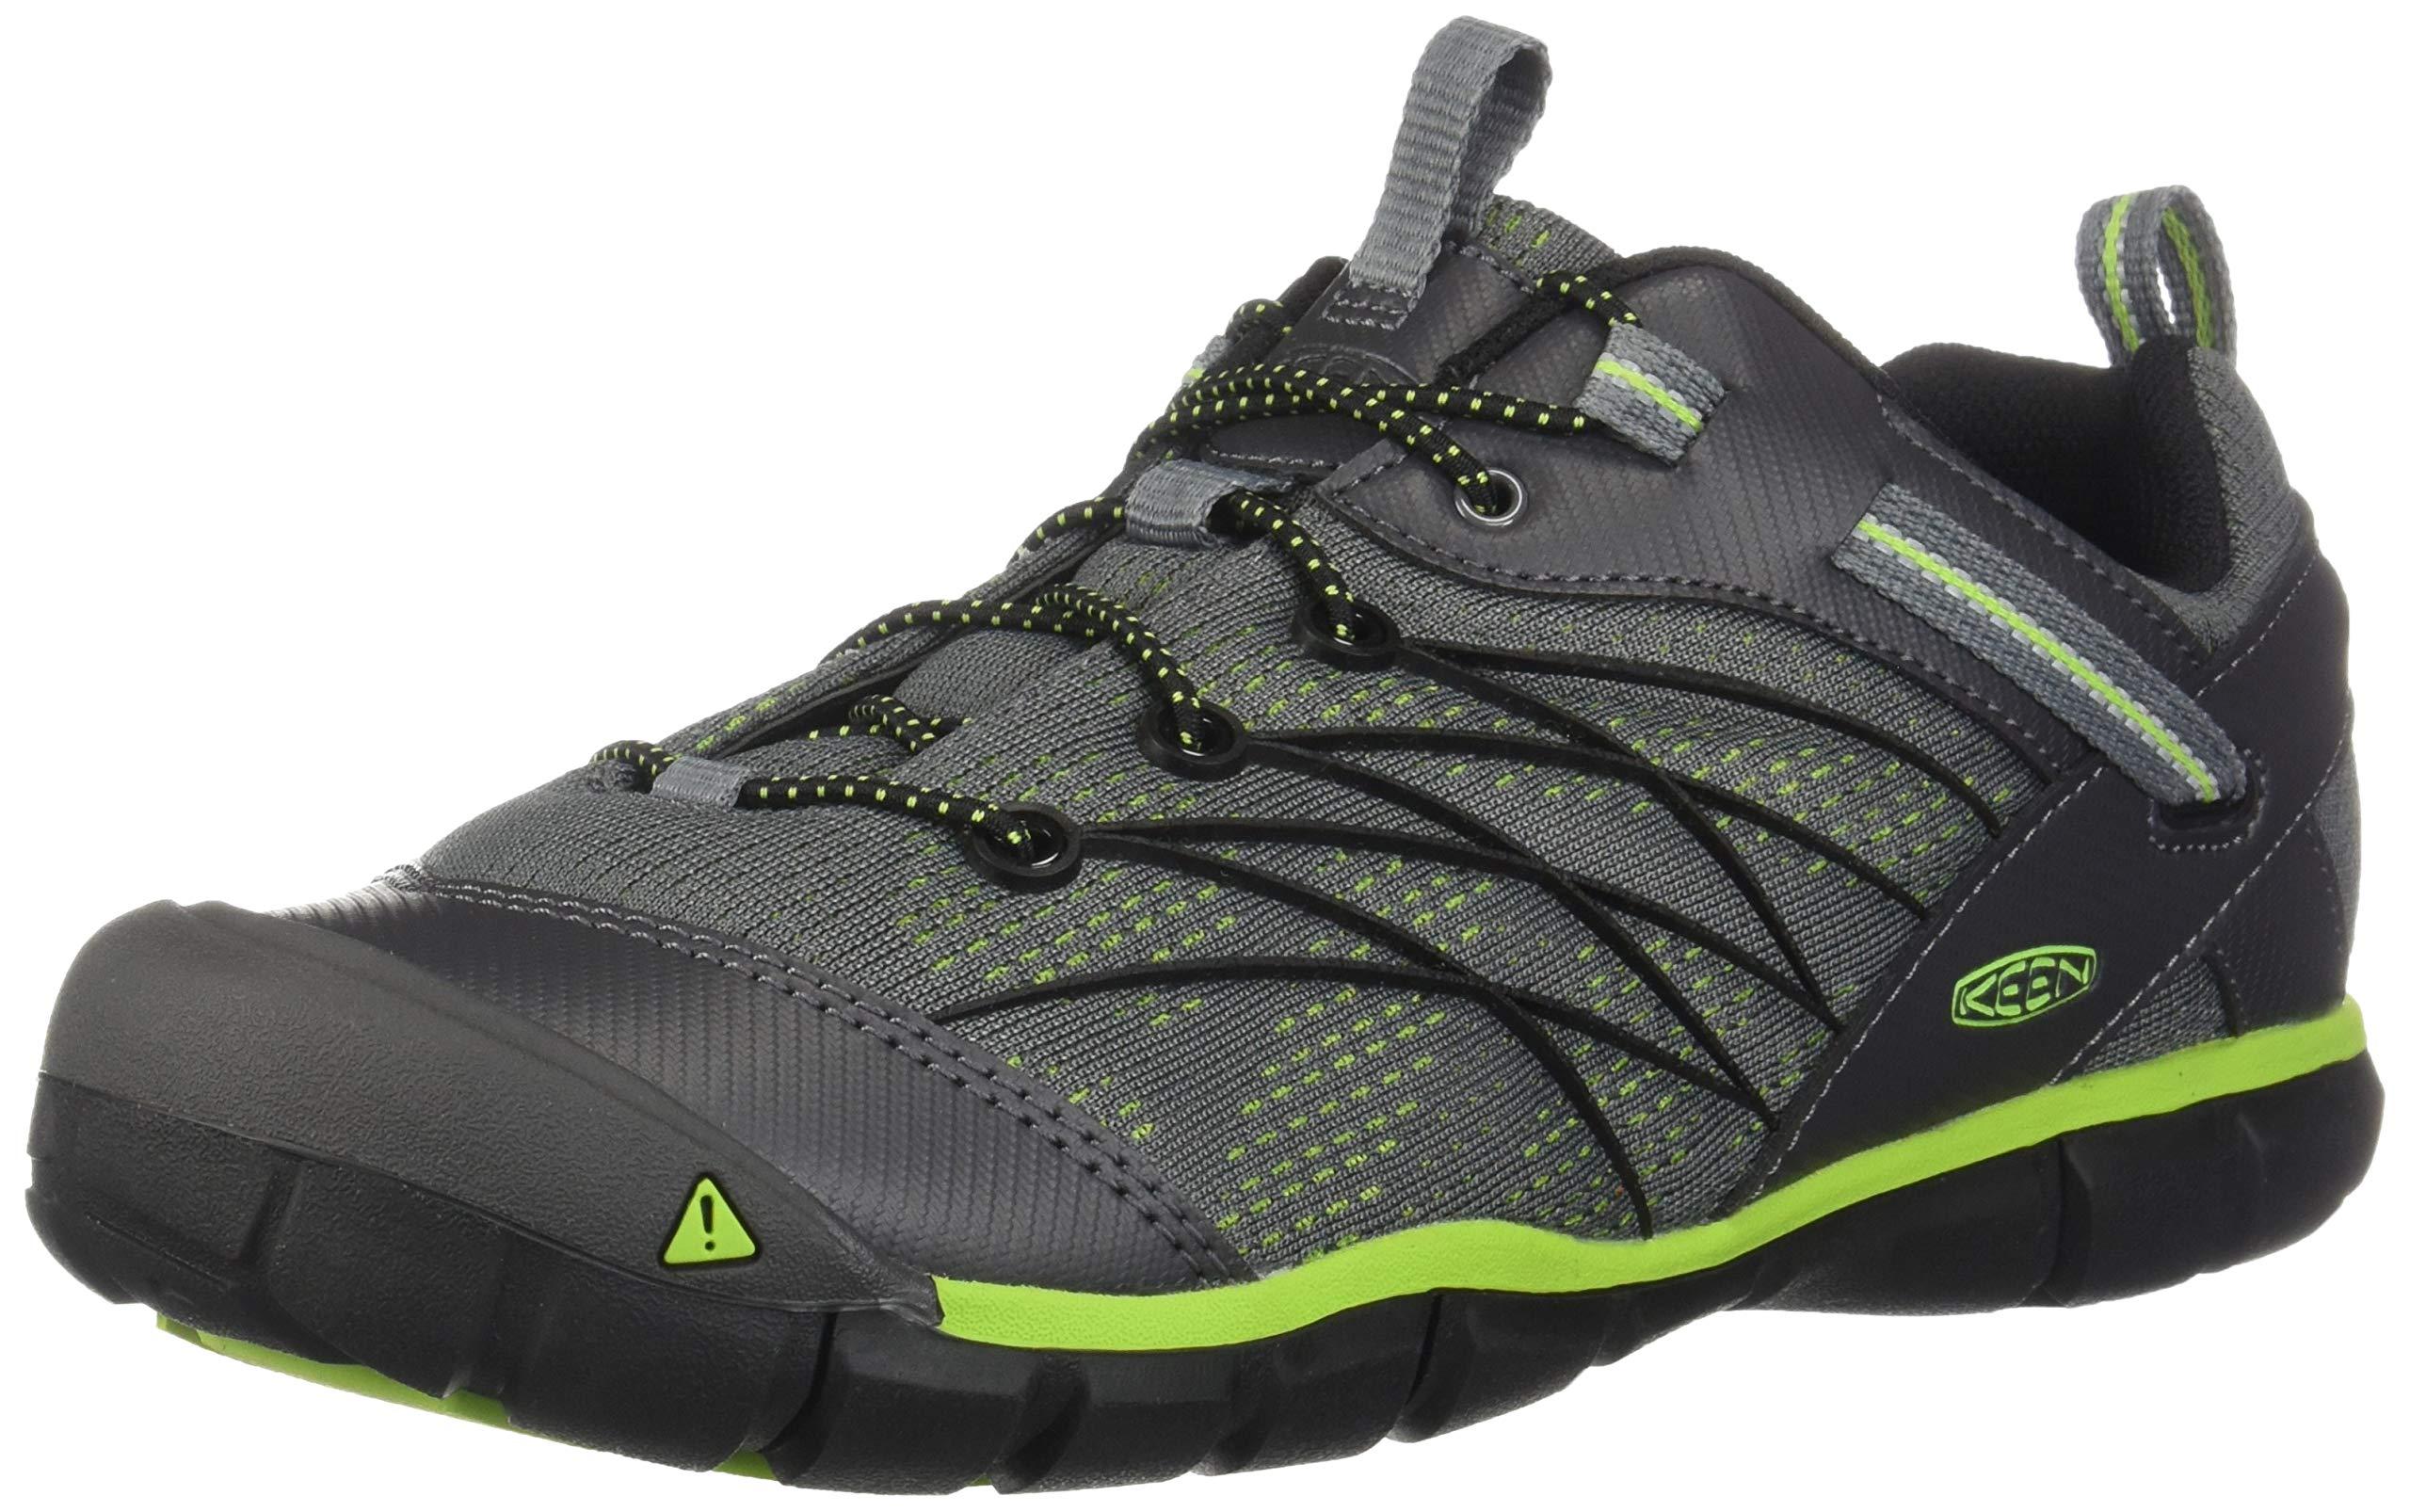 KEEN Chandler CNX Hiking Shoe - Boys' Magnet/Greenery, 7.0